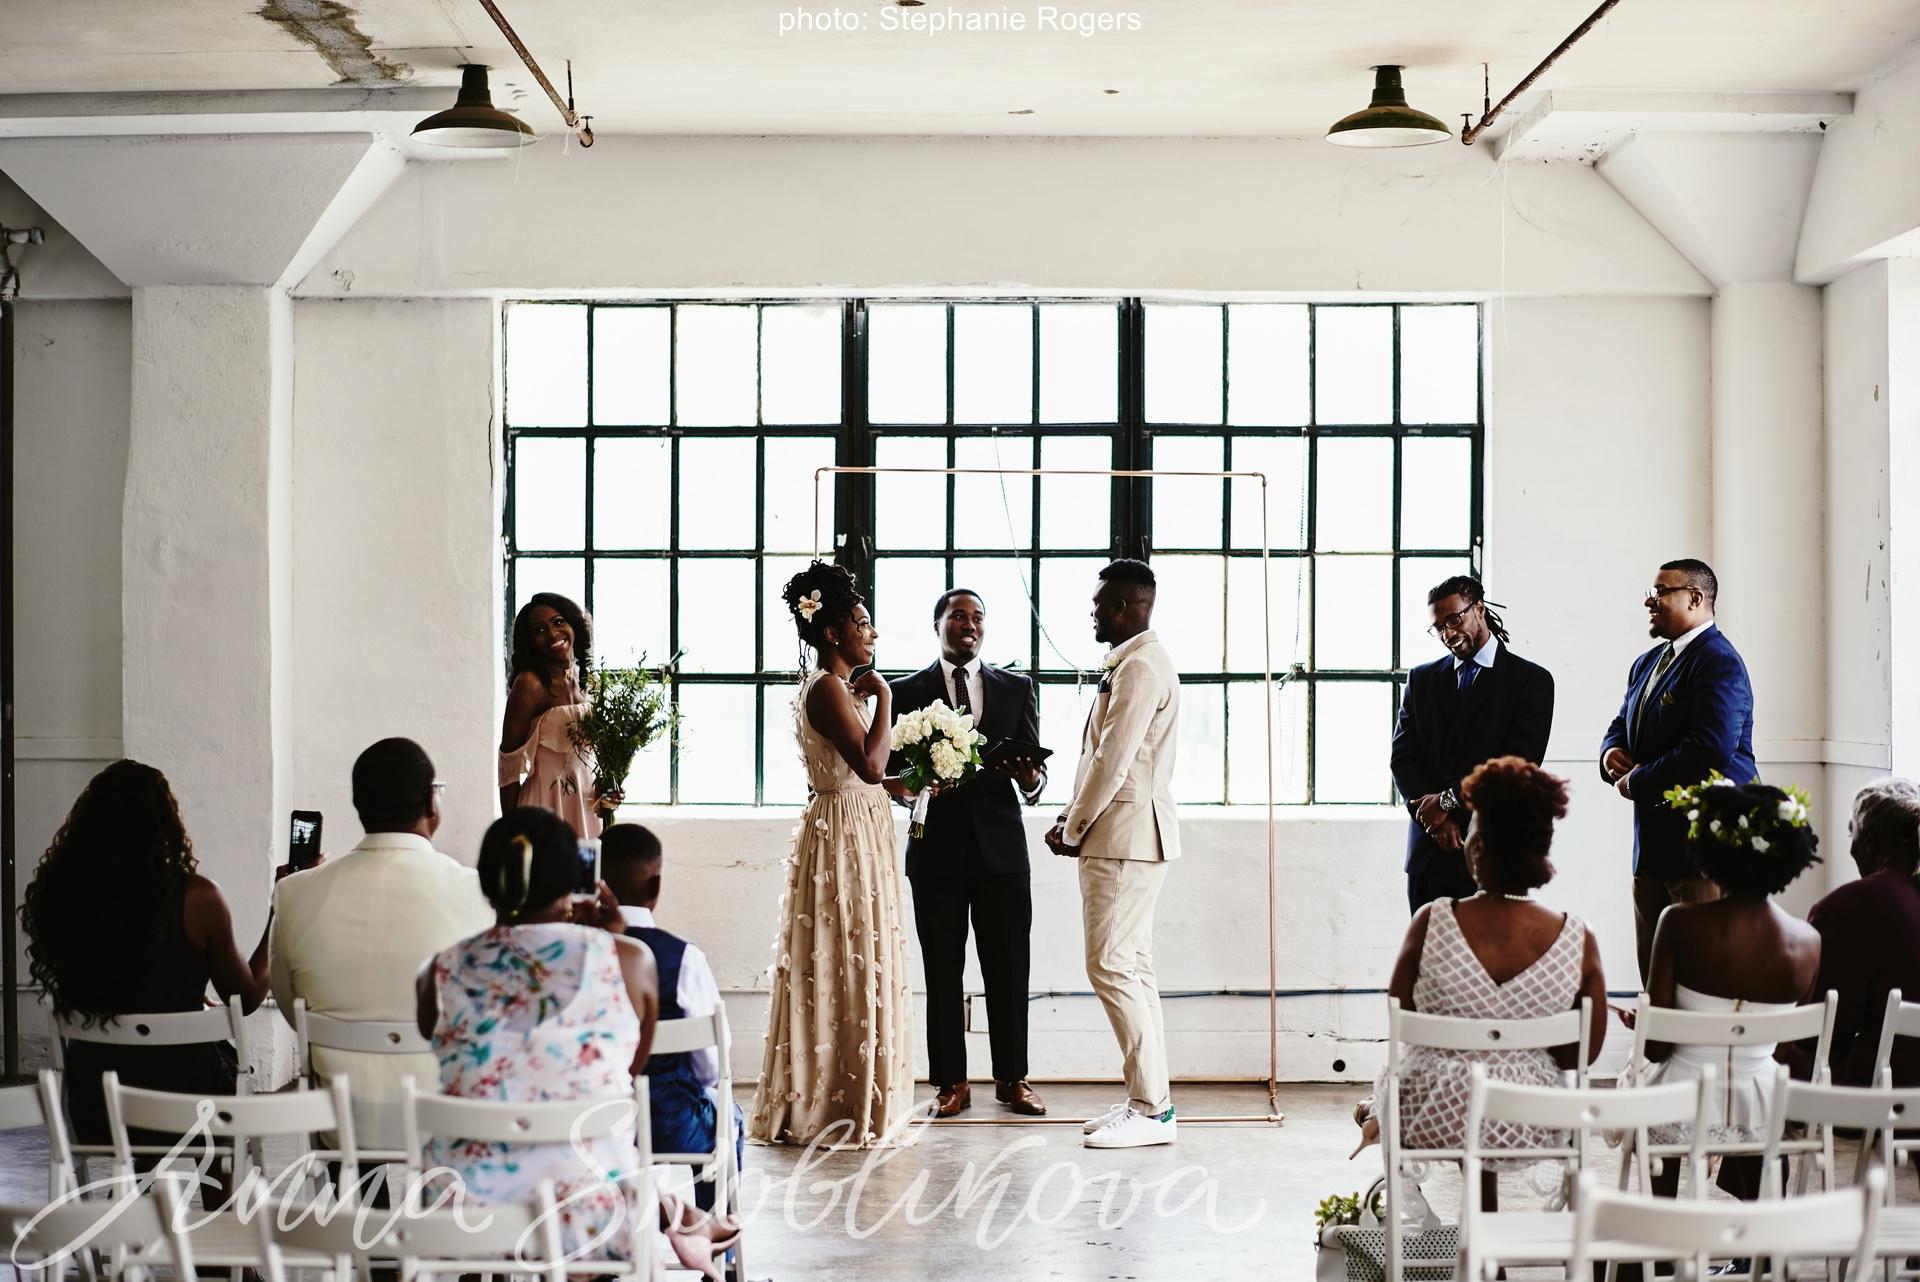 Deun and Eric \ Silk Wedding dress by Anna SKoblikova